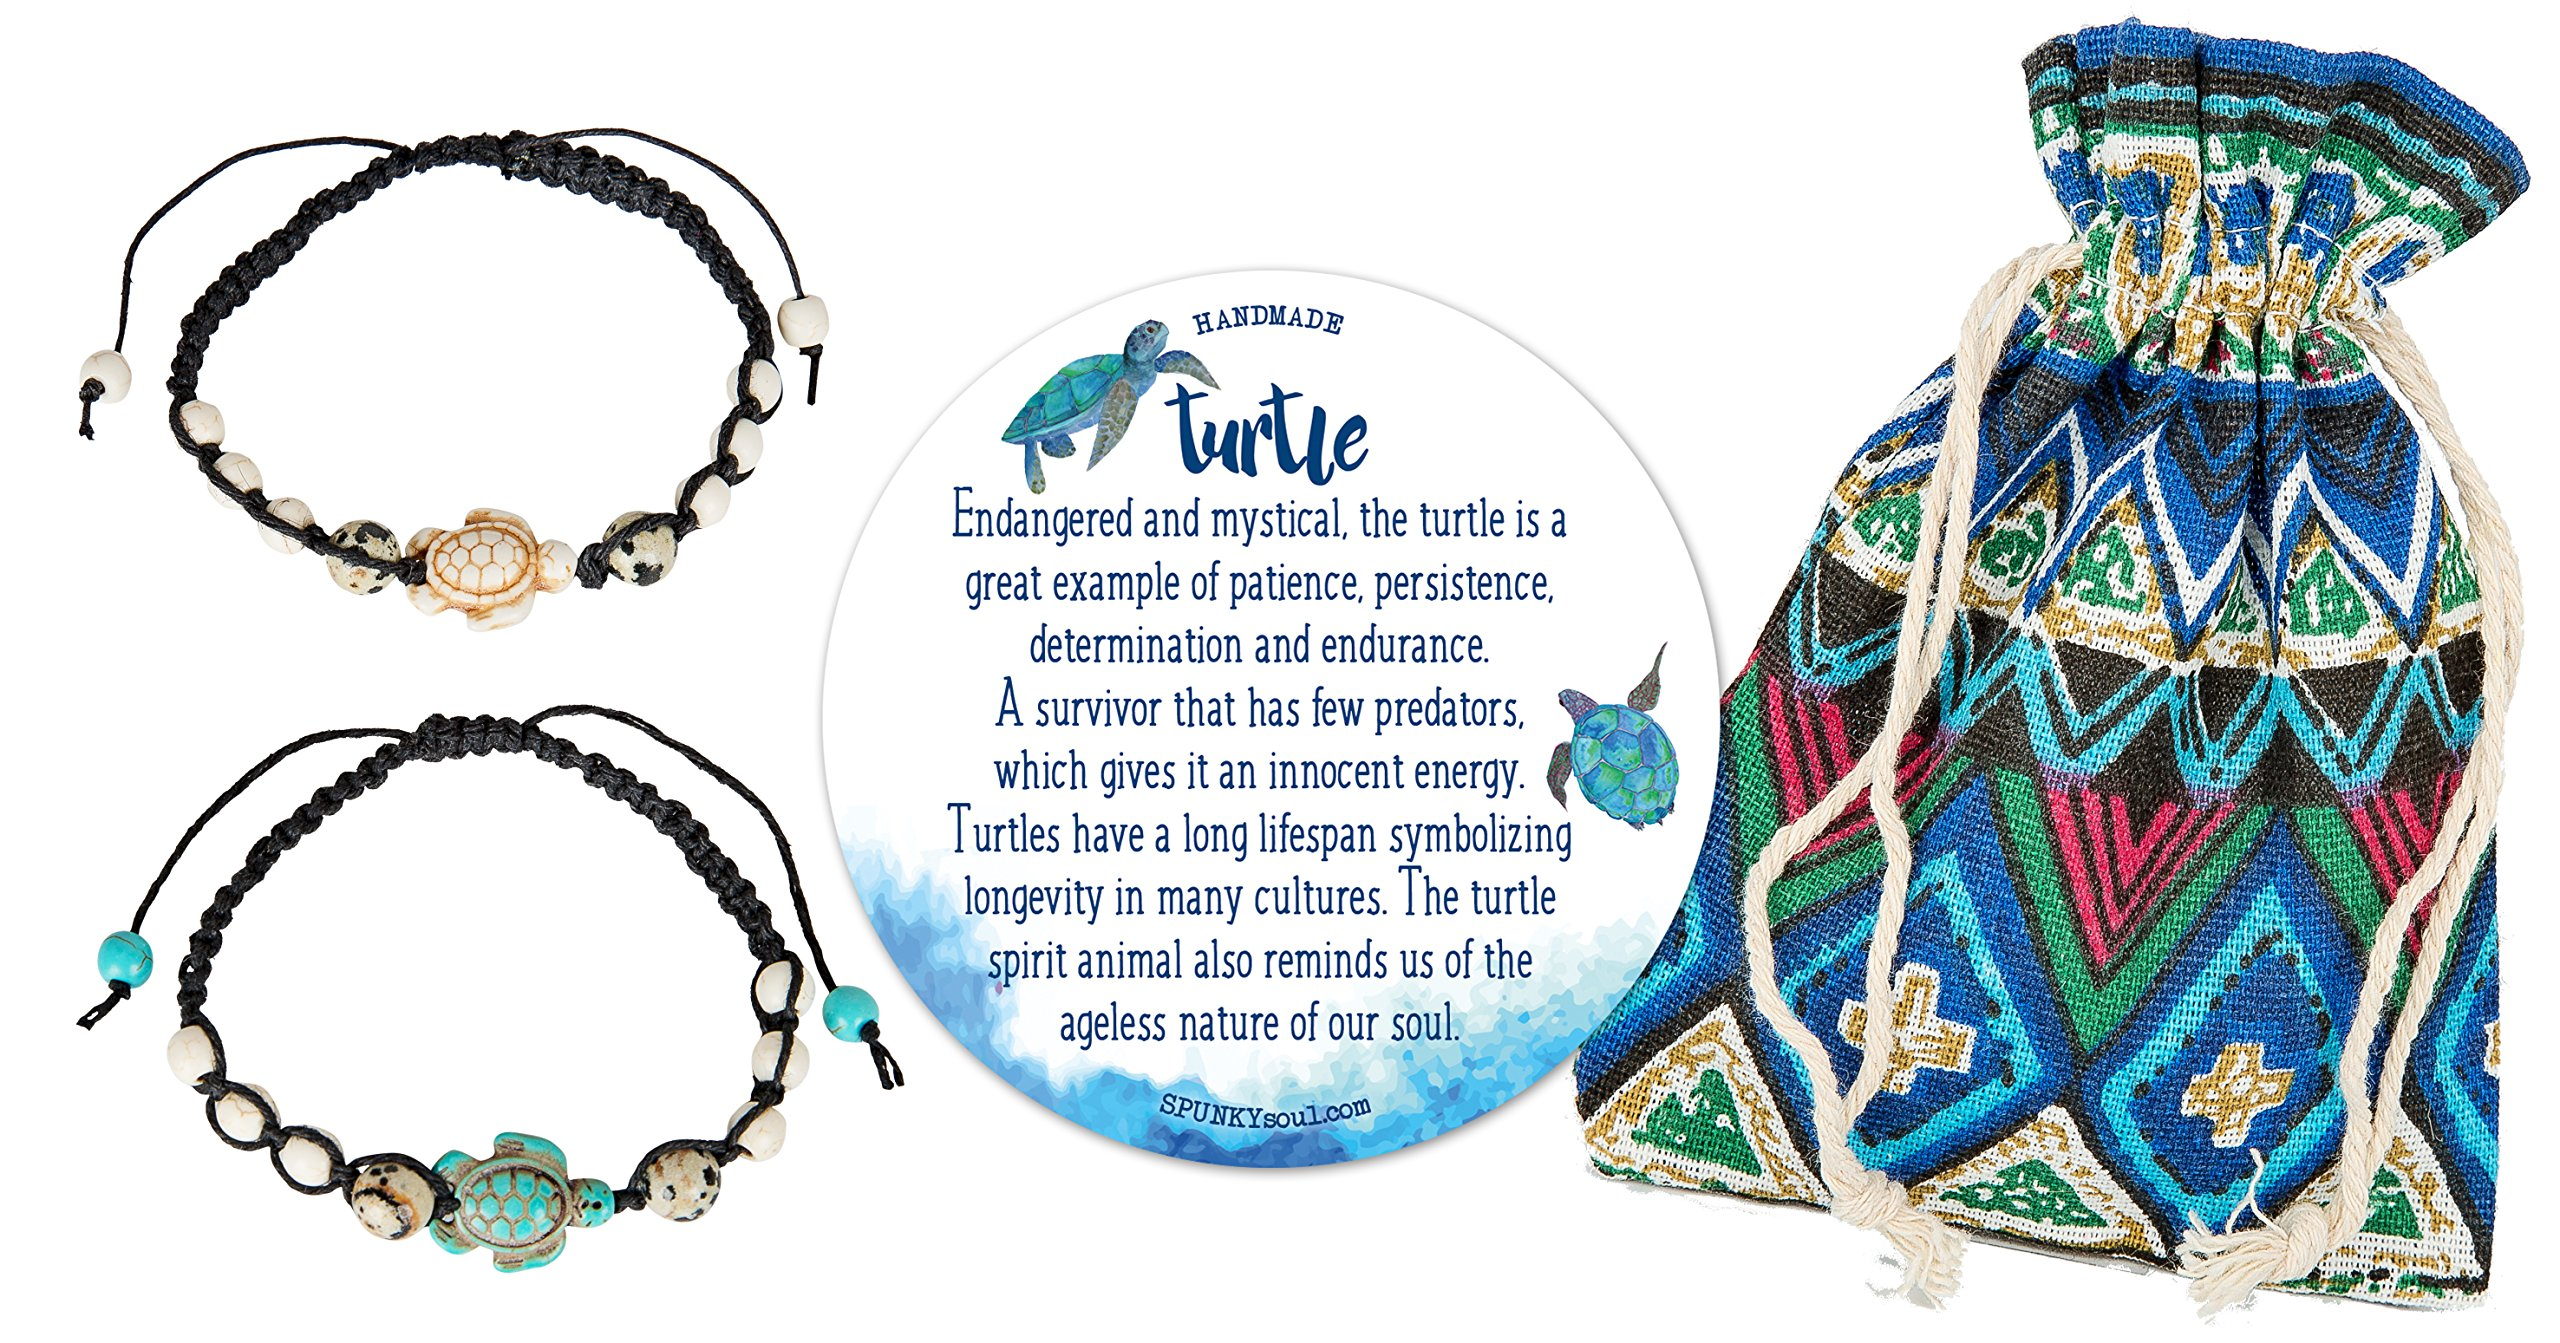 SPUNKYsoul Turtle Bracelet Set Adjustable Best Friend Couples Distance (or Anklet) Dalmatian Howlite Collection (2 Pack)